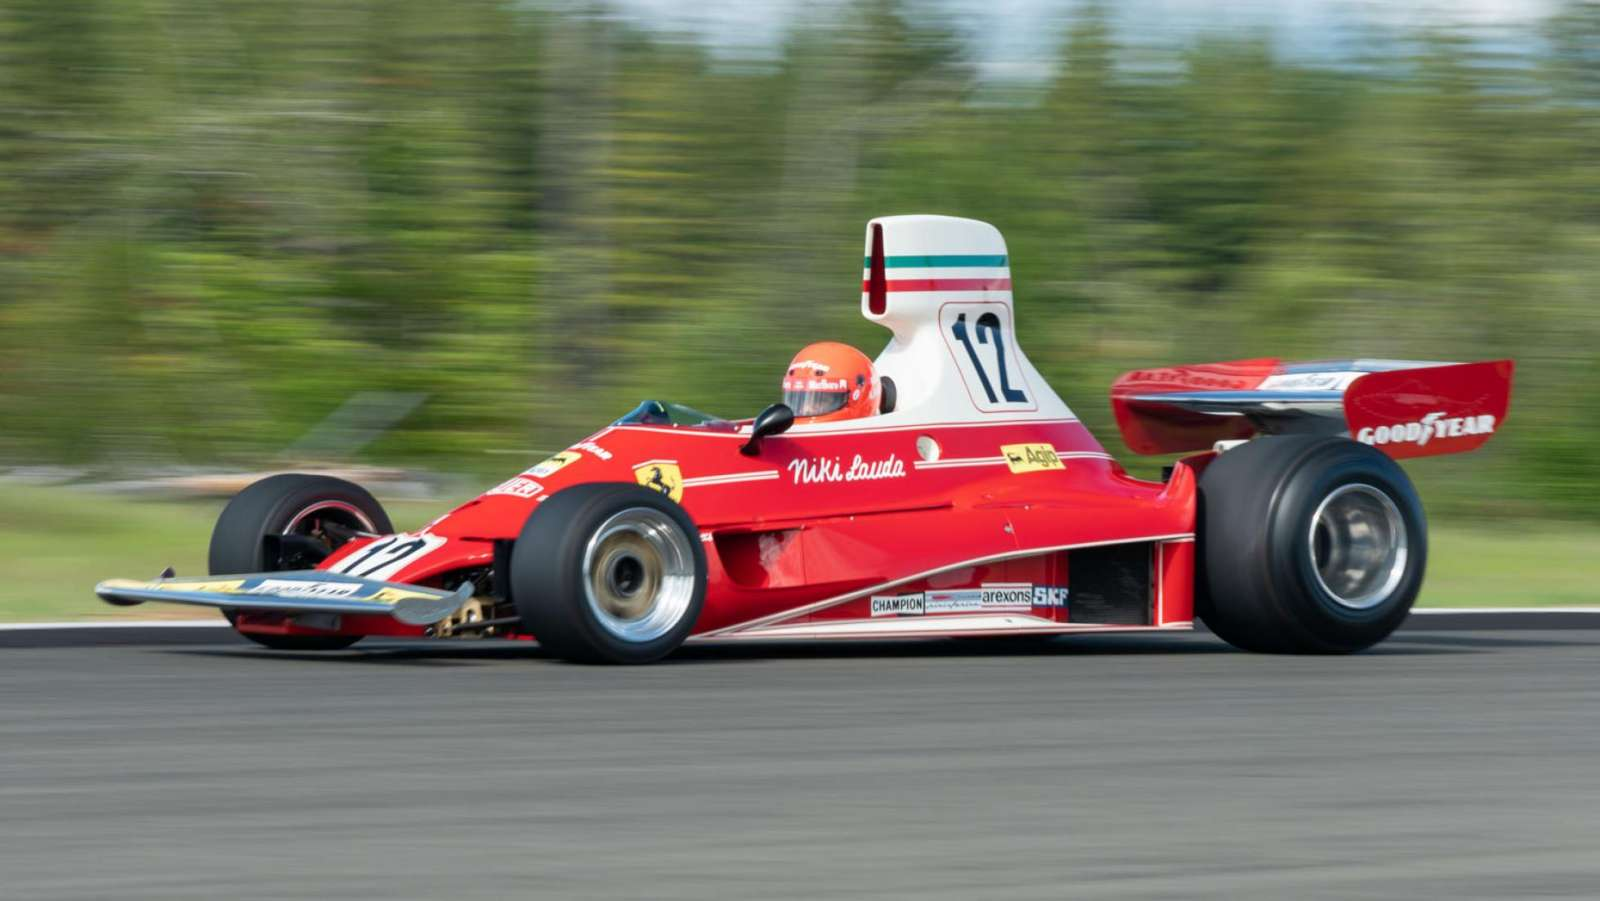 Ferrari 312t-32